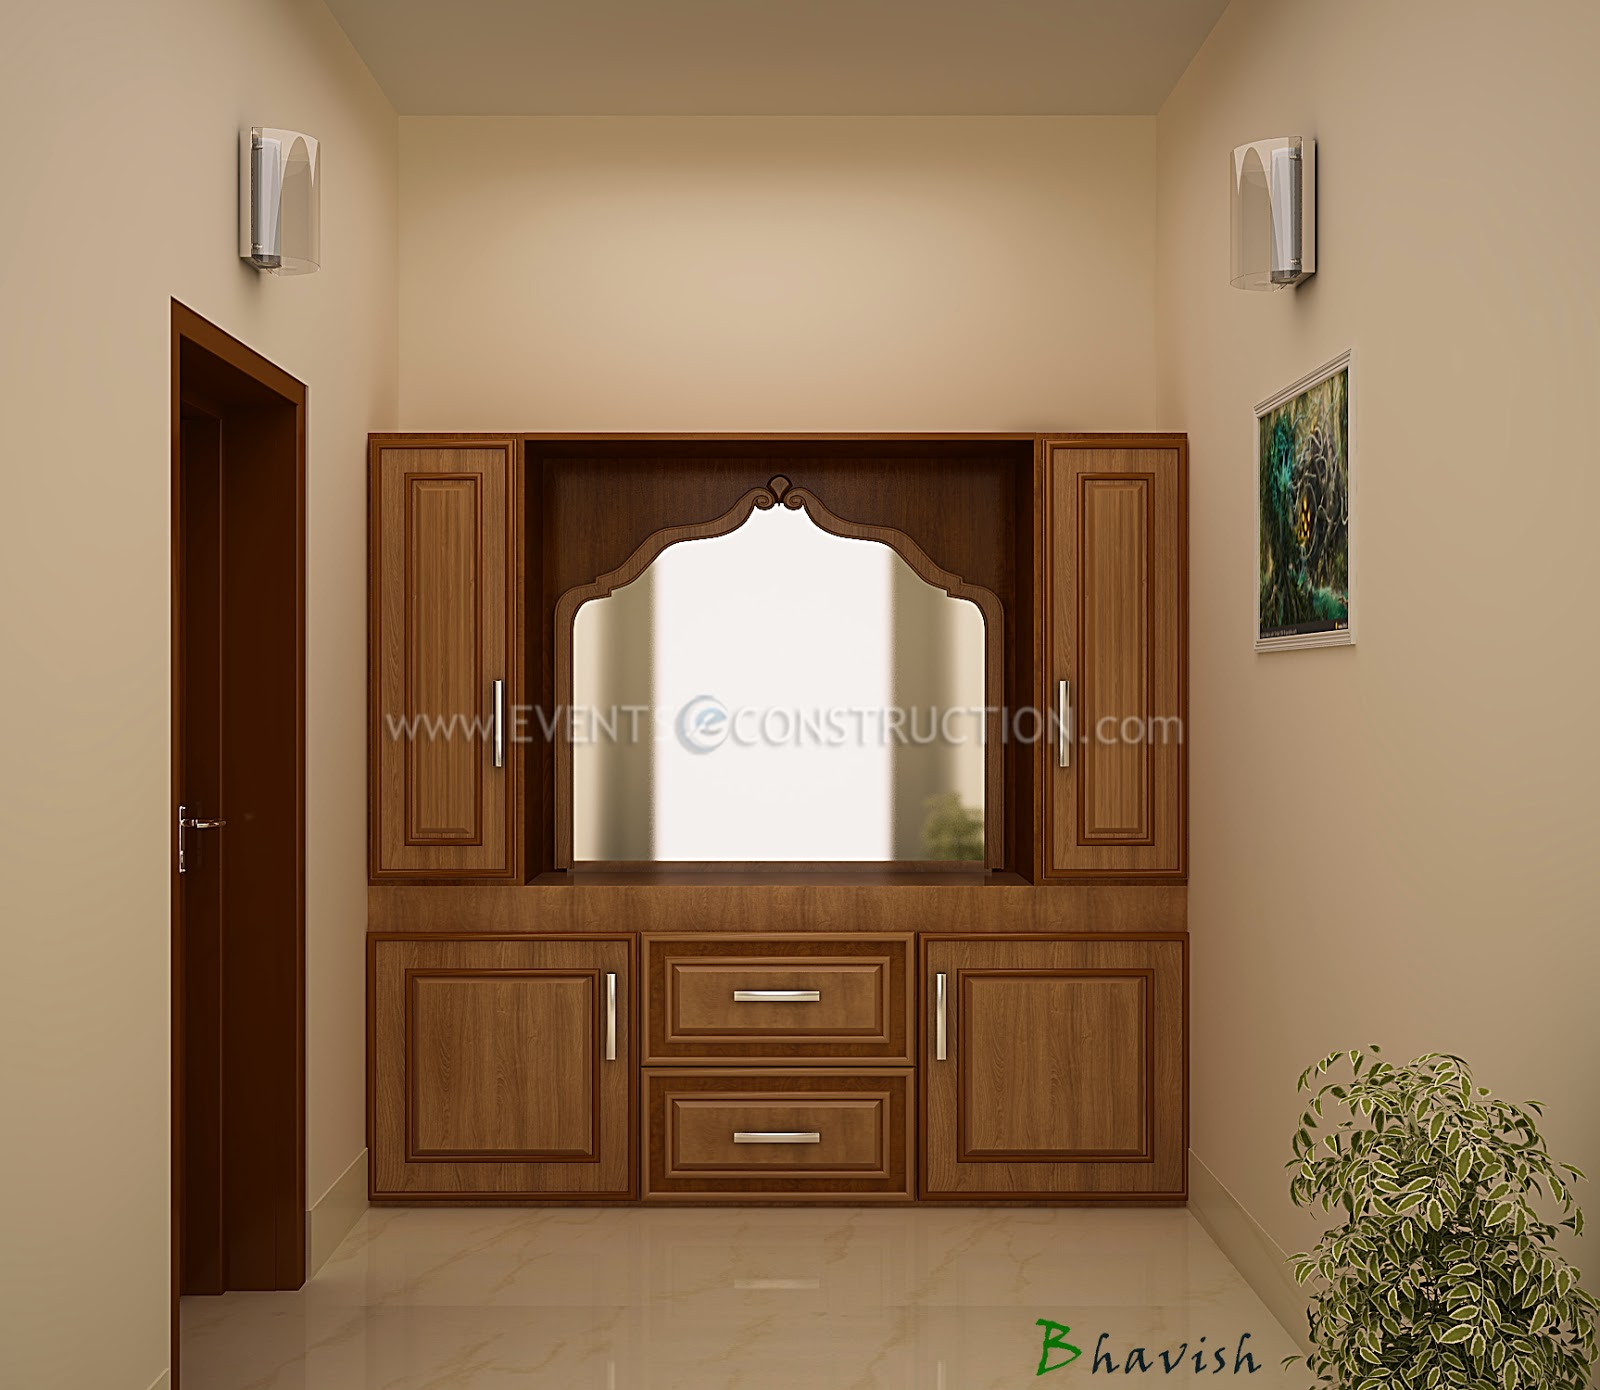 Interior Design Bedroom Kerala Style Bedroom Decor Dark Furniture Bedroom Ideas Rectangular Rooms Boys Bedroom Colour Ideas: Evens Construction Pvt Ltd: Beautiful Dressing Table Design